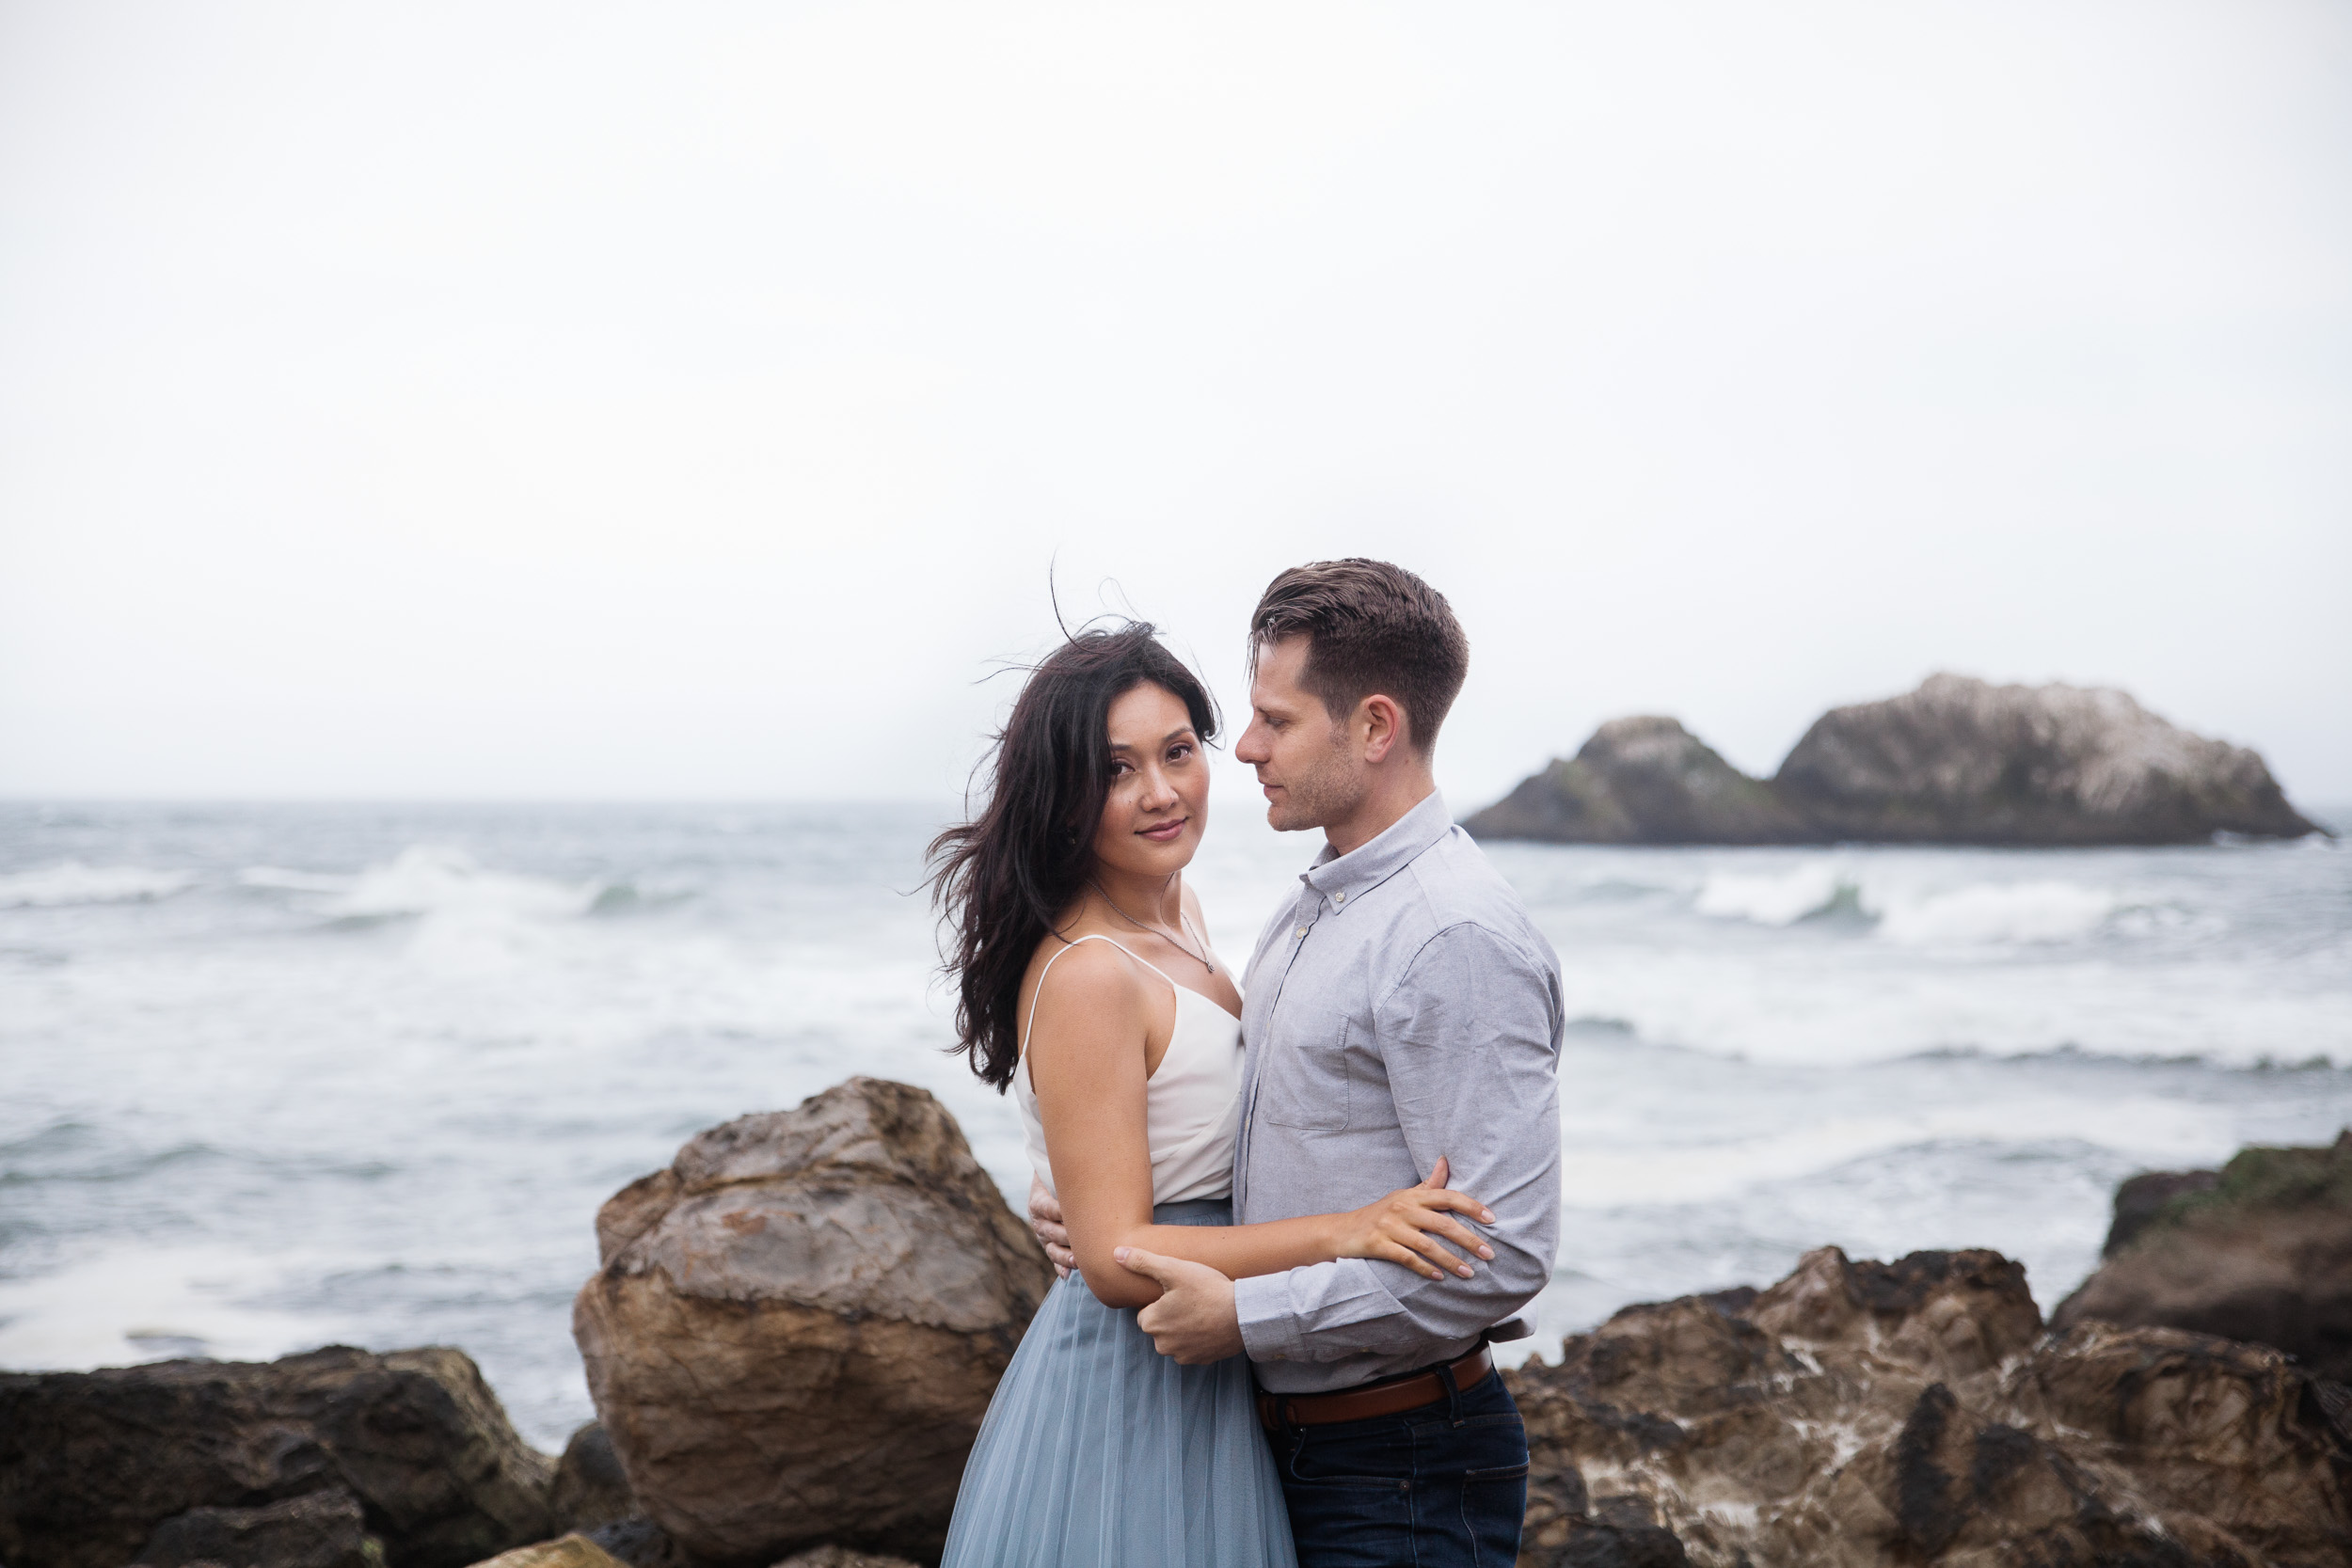 040716_Cristina+Tim_San Francisco Engagement_Buena Lane Photography_591-Edit.jpg